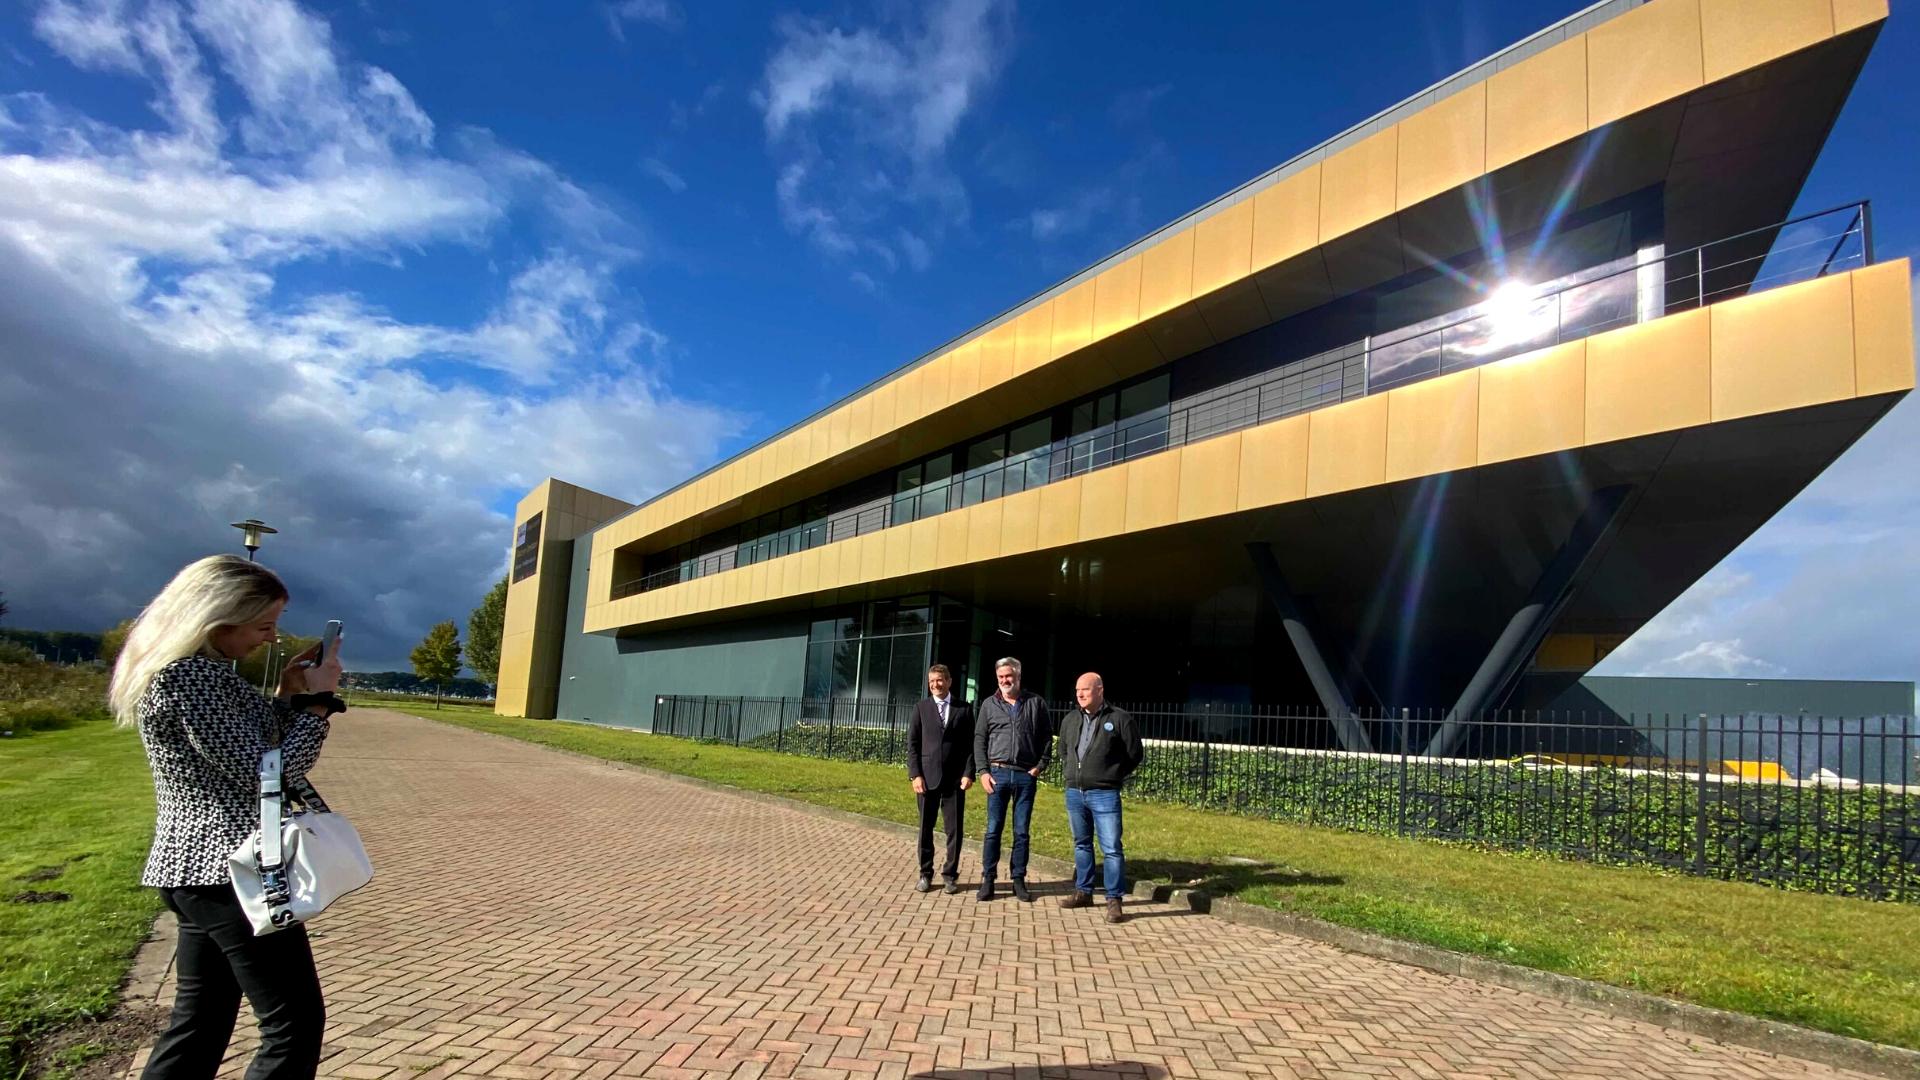 Casadei-Allpro-visit-Netherlands-Univacco-Waalwijk-gevelbekleding-golden-facade-sunshine